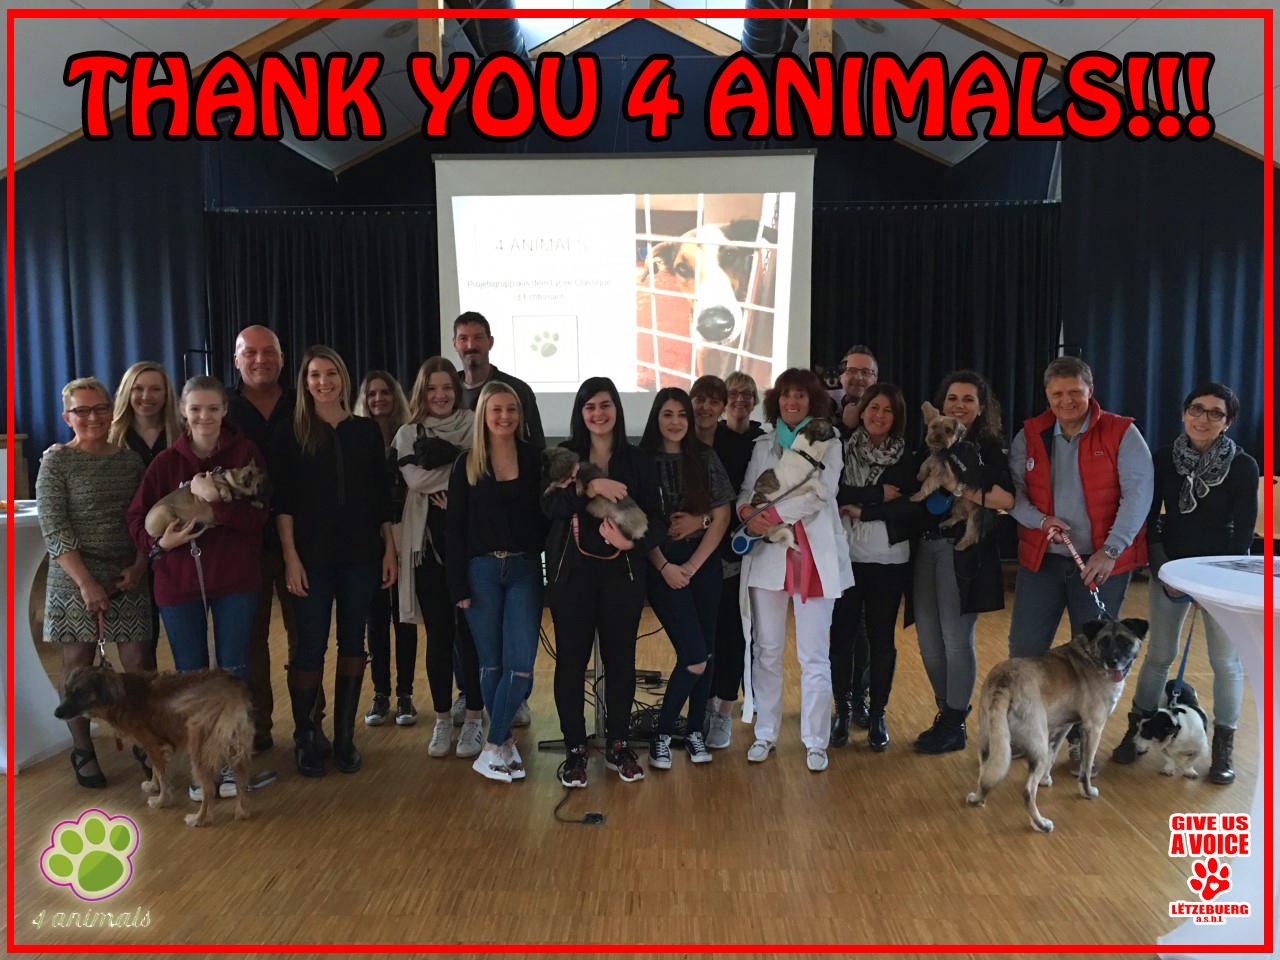 Thank you 4 Animals copy